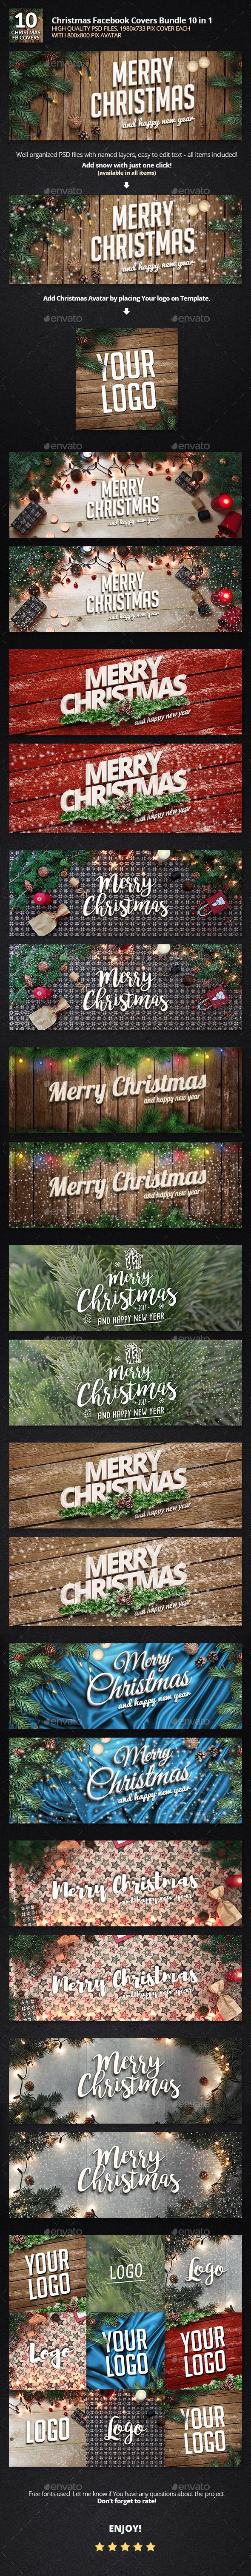 Christmas Facebook Bundle 10 in 1 - Facebook Timeline Covers Social Media